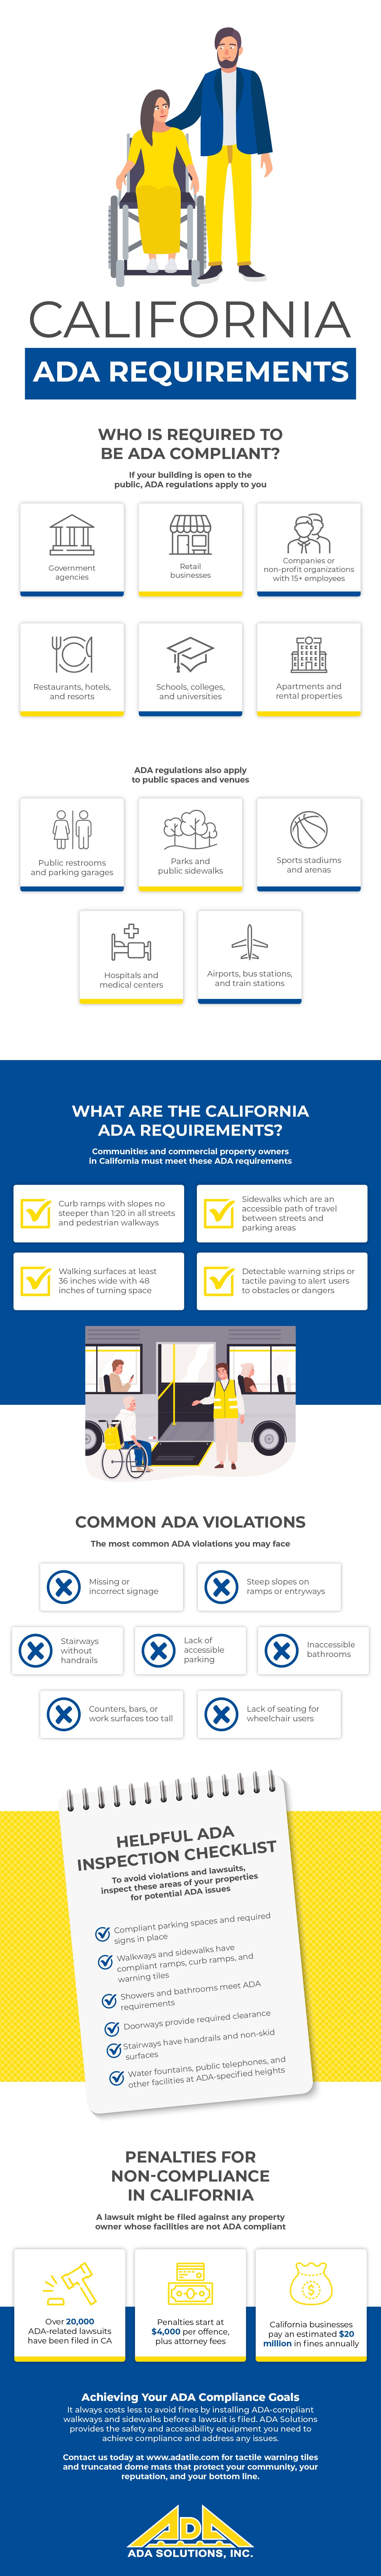 California ADA Requirements Infographic